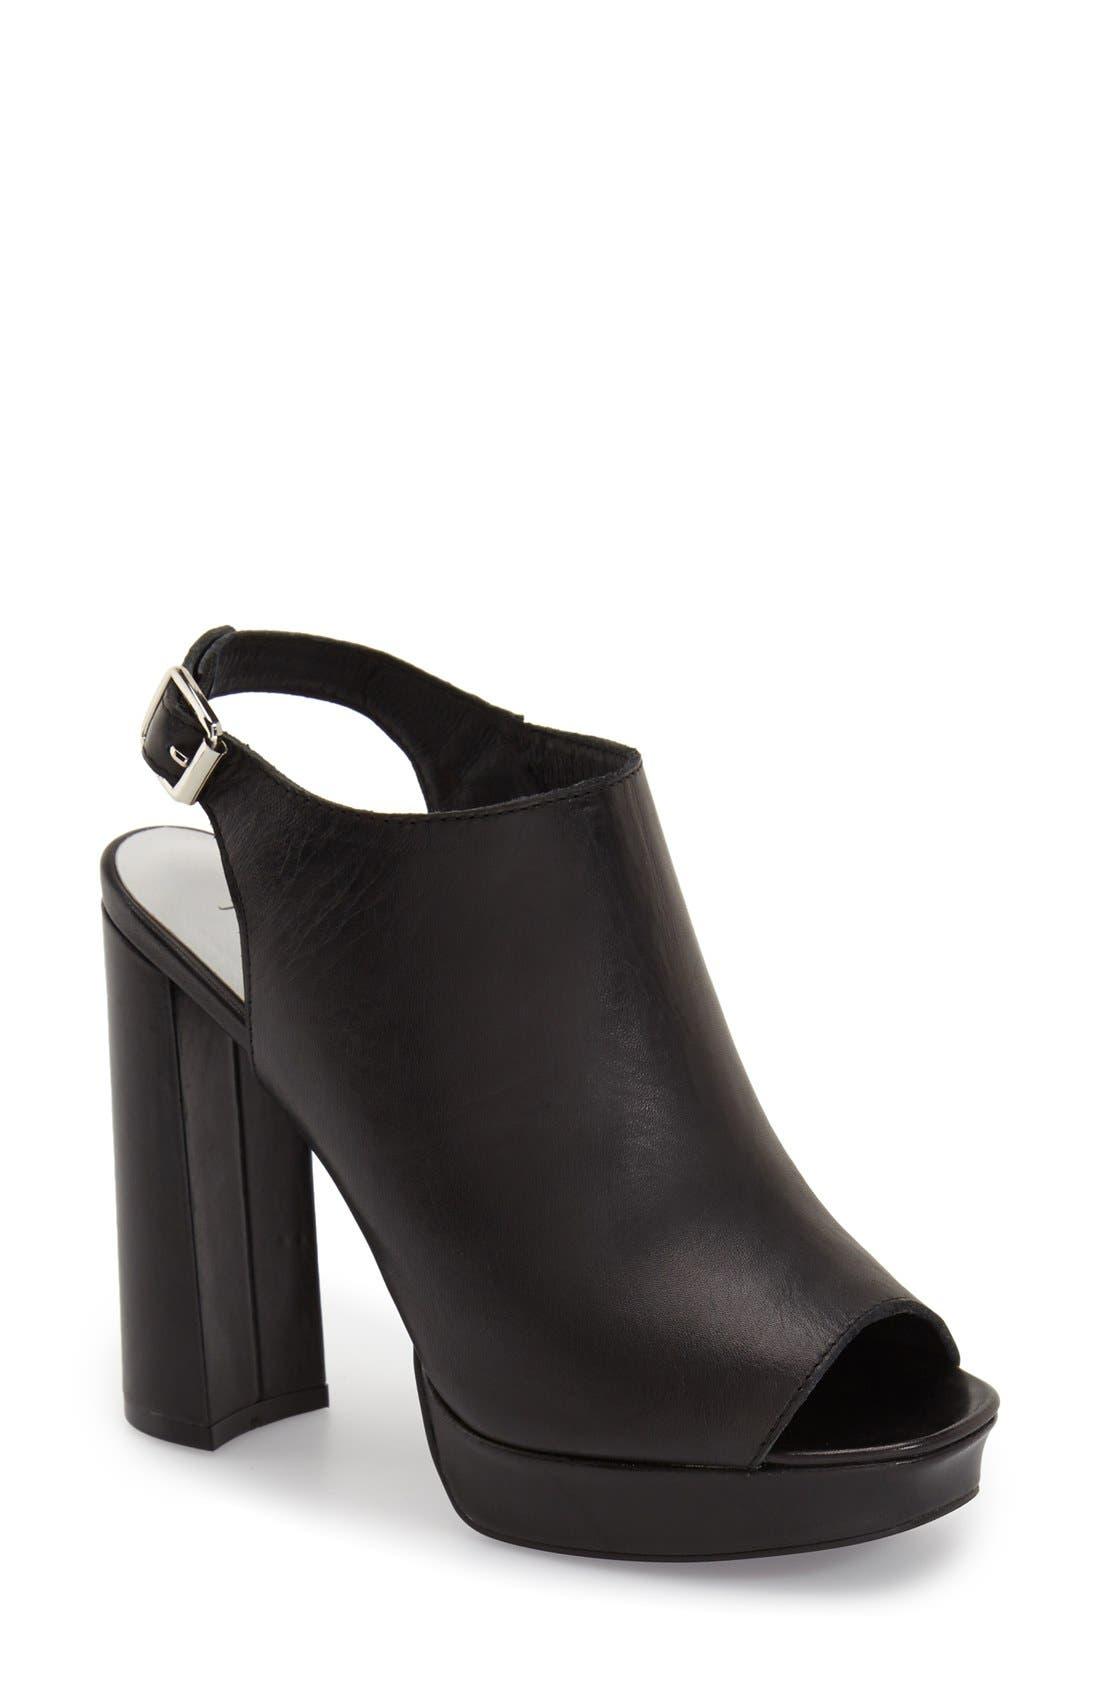 Main Image - Jeffrey Campbell 'Payola' Platform Sandal (Women)